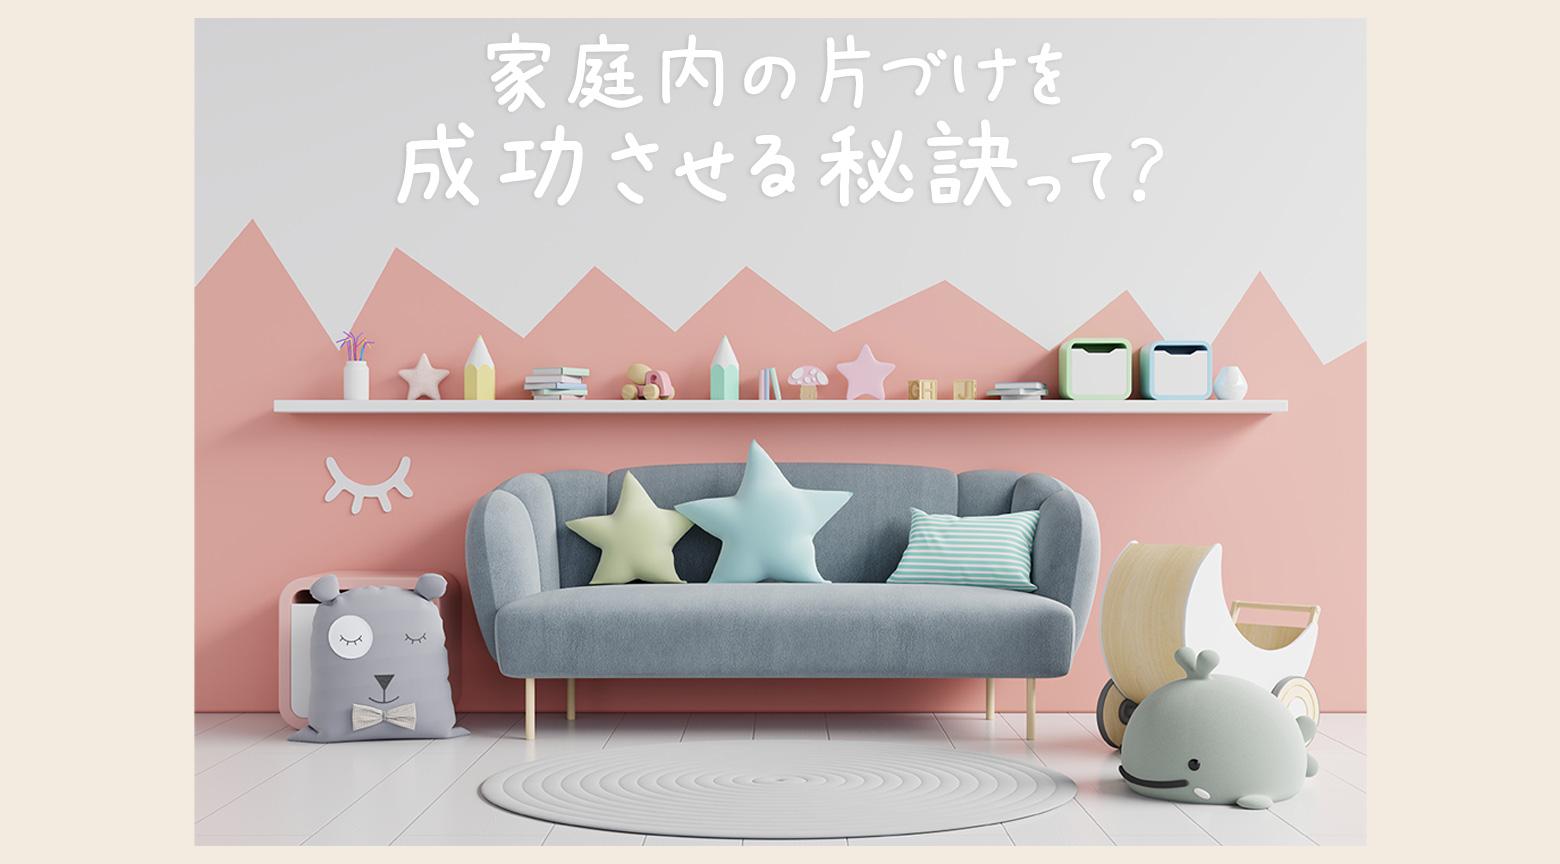 K.cafe Change~「かたづけ」×「かかわり」~ 第1回